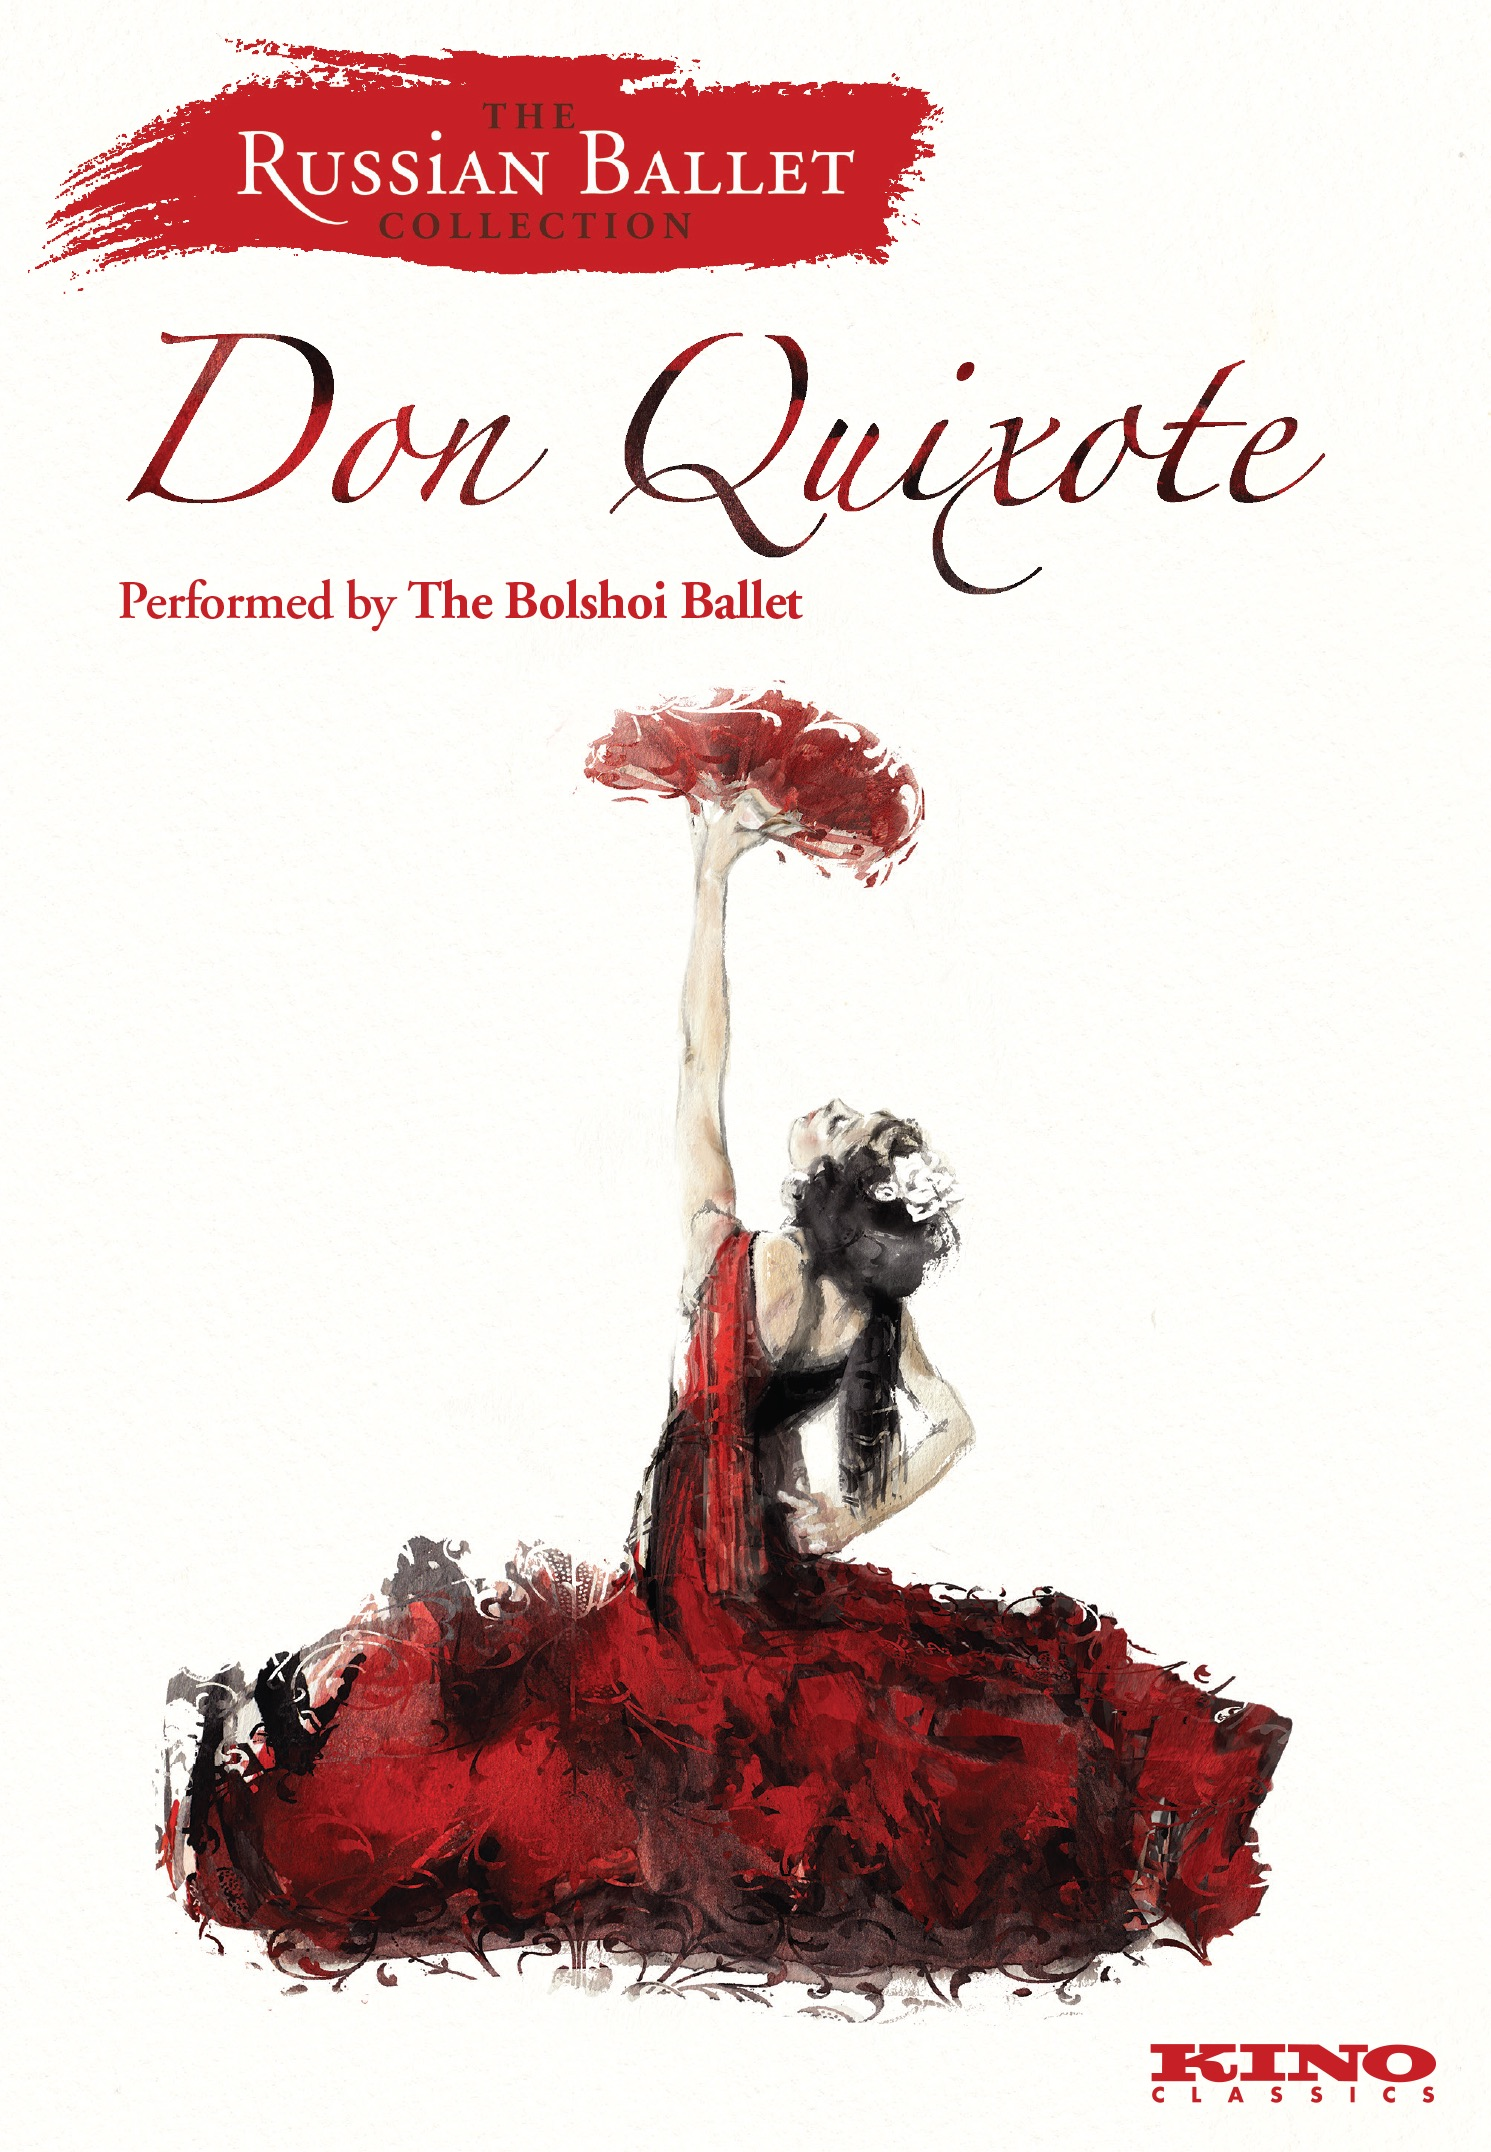 Russian Ballet Don Quixote.jpg